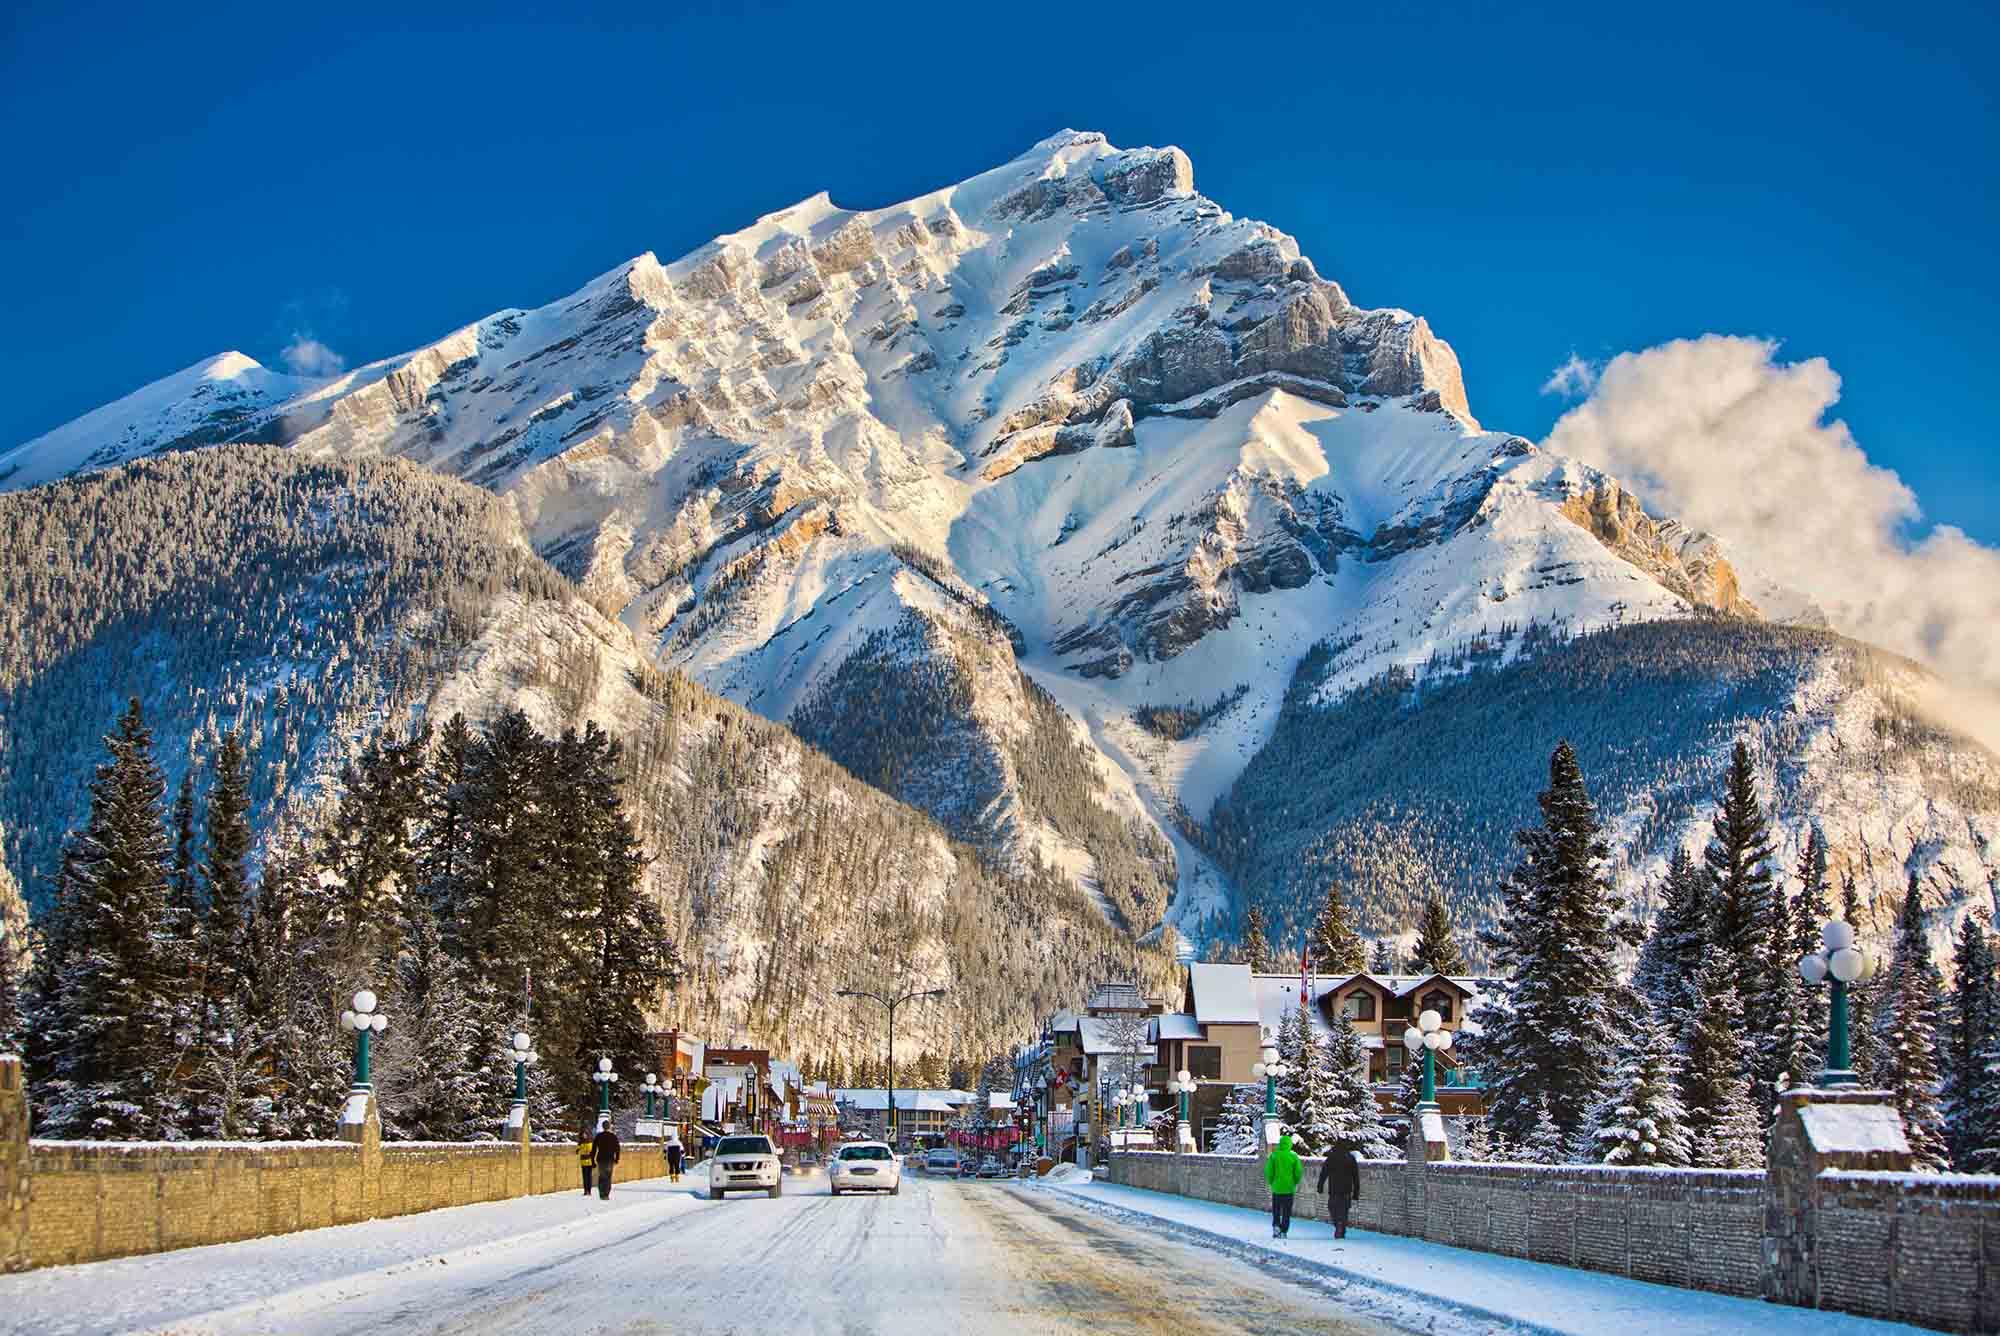 Banff & Lake Louise Tourism / Paul Zizka Photography